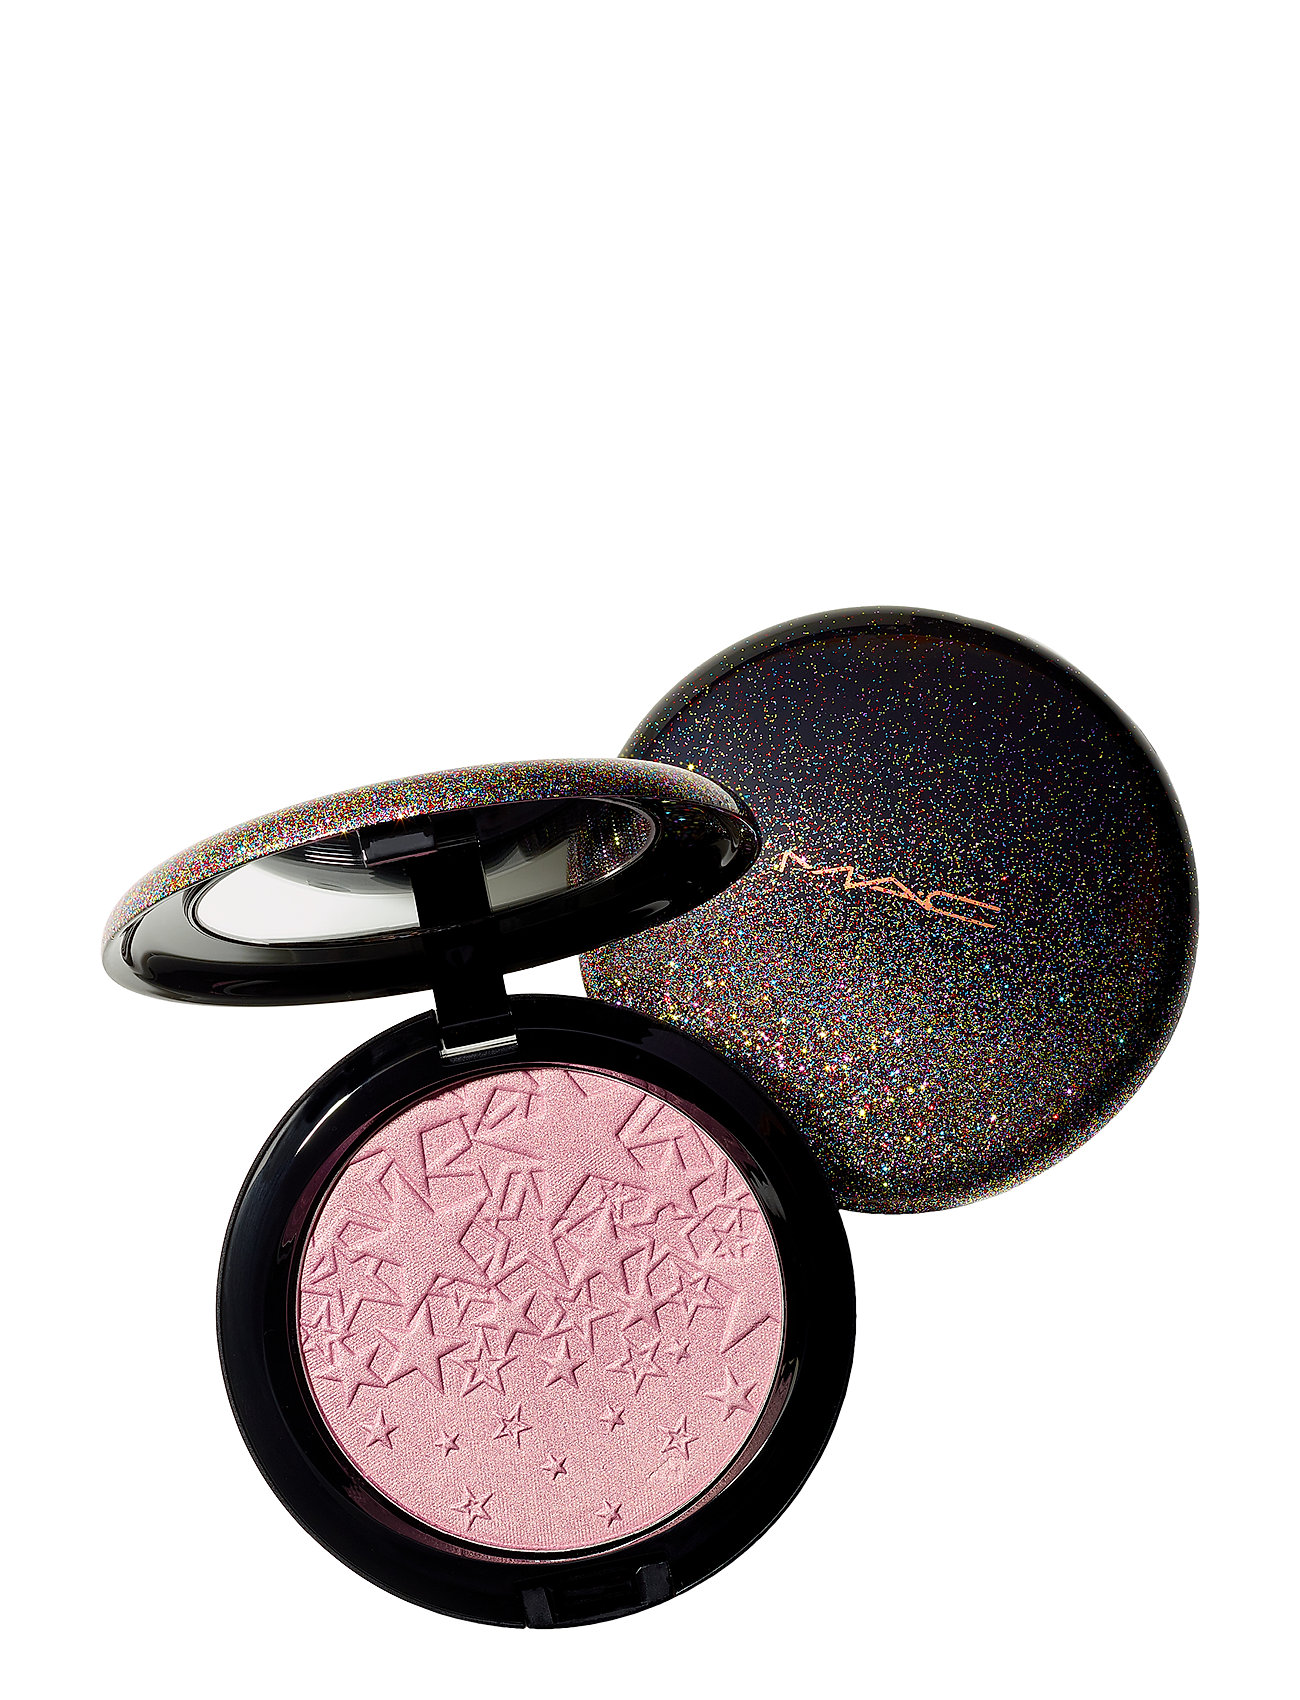 Image of Opalescent Powder Beauty WOMEN Makeup Face Blush M.A.C. (3406229867)